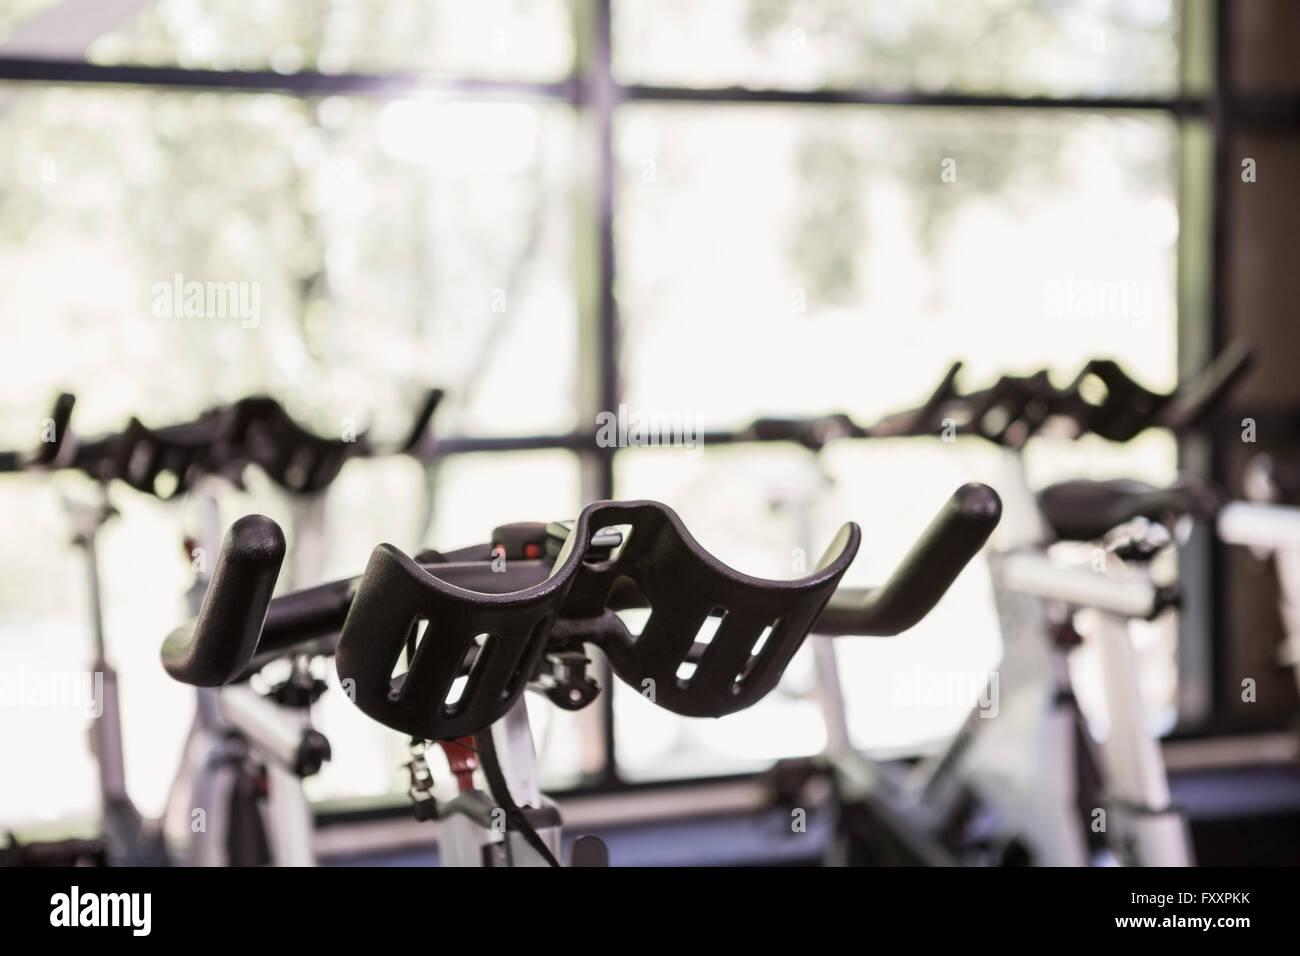 Close-up of exercise bike Stock Photo